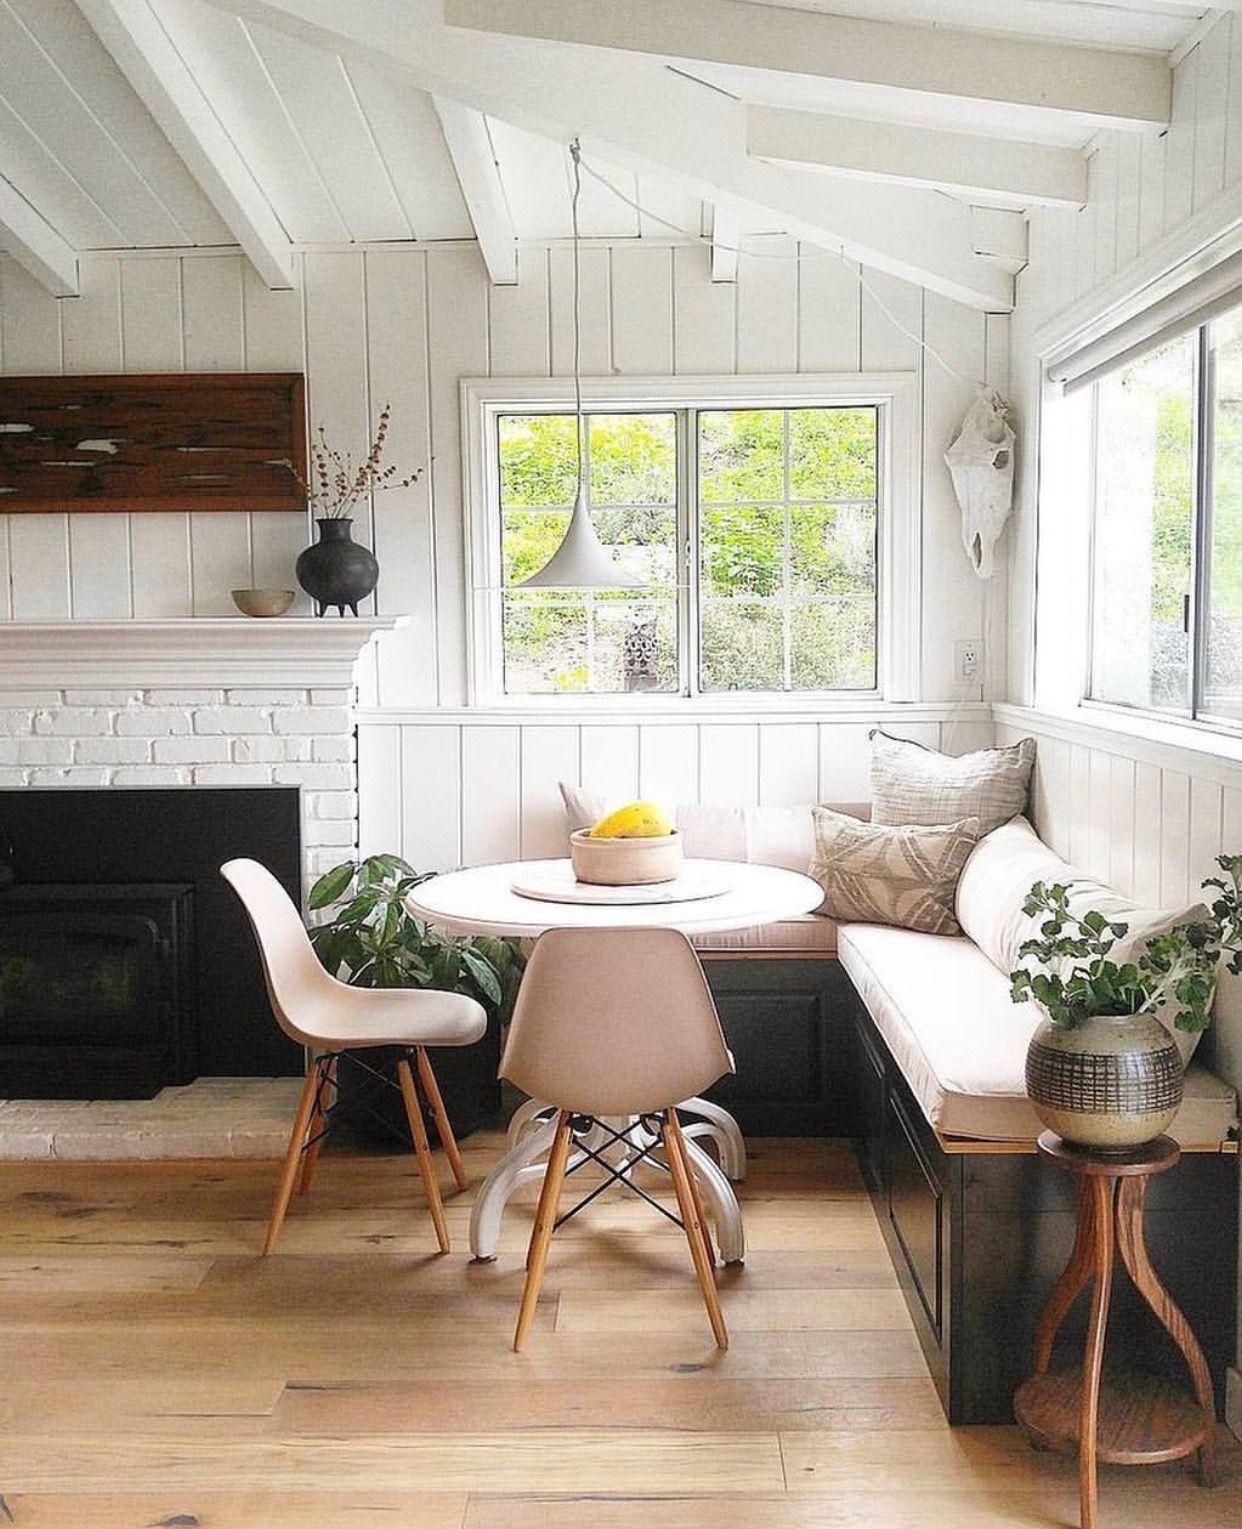 Breakfast Nook Design | Breakfast Nook Ideas | Dining room ... on Nook's Cranny Design Ideas  id=79592